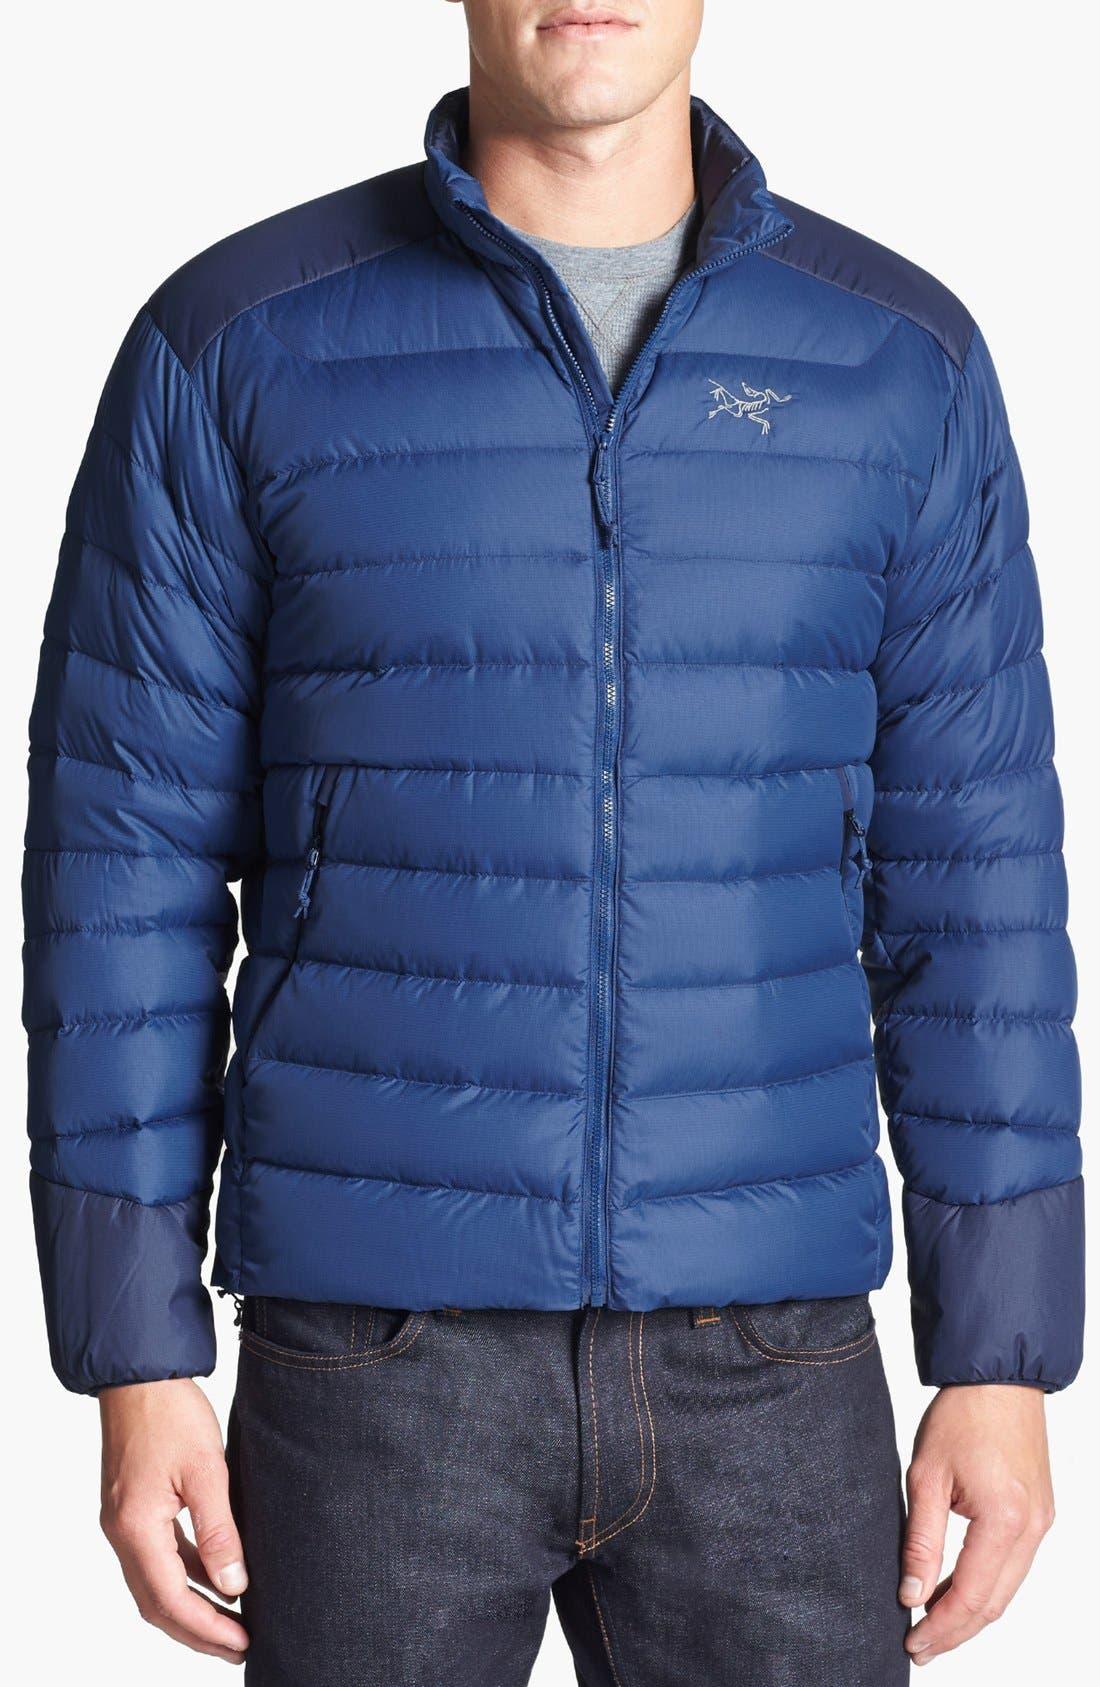 Alternate Image 1 Selected - Arc'teryx 'Thorium AR' Athletic Fit Down Jacket